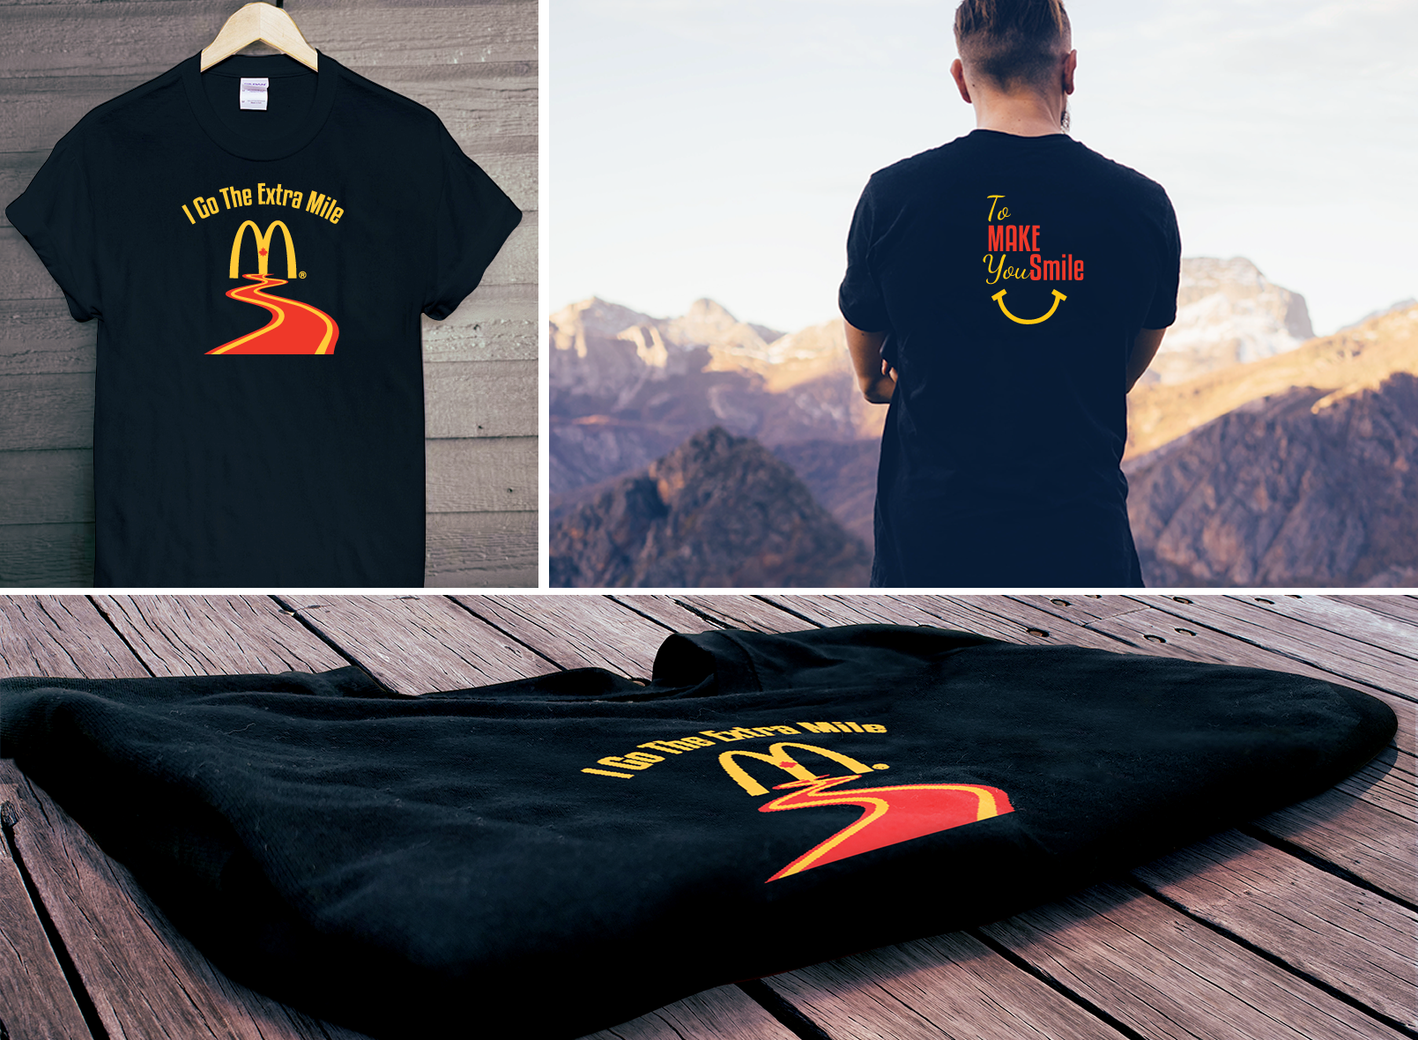 McDonalds-black-T-mockup-lifestyle2.1.pn